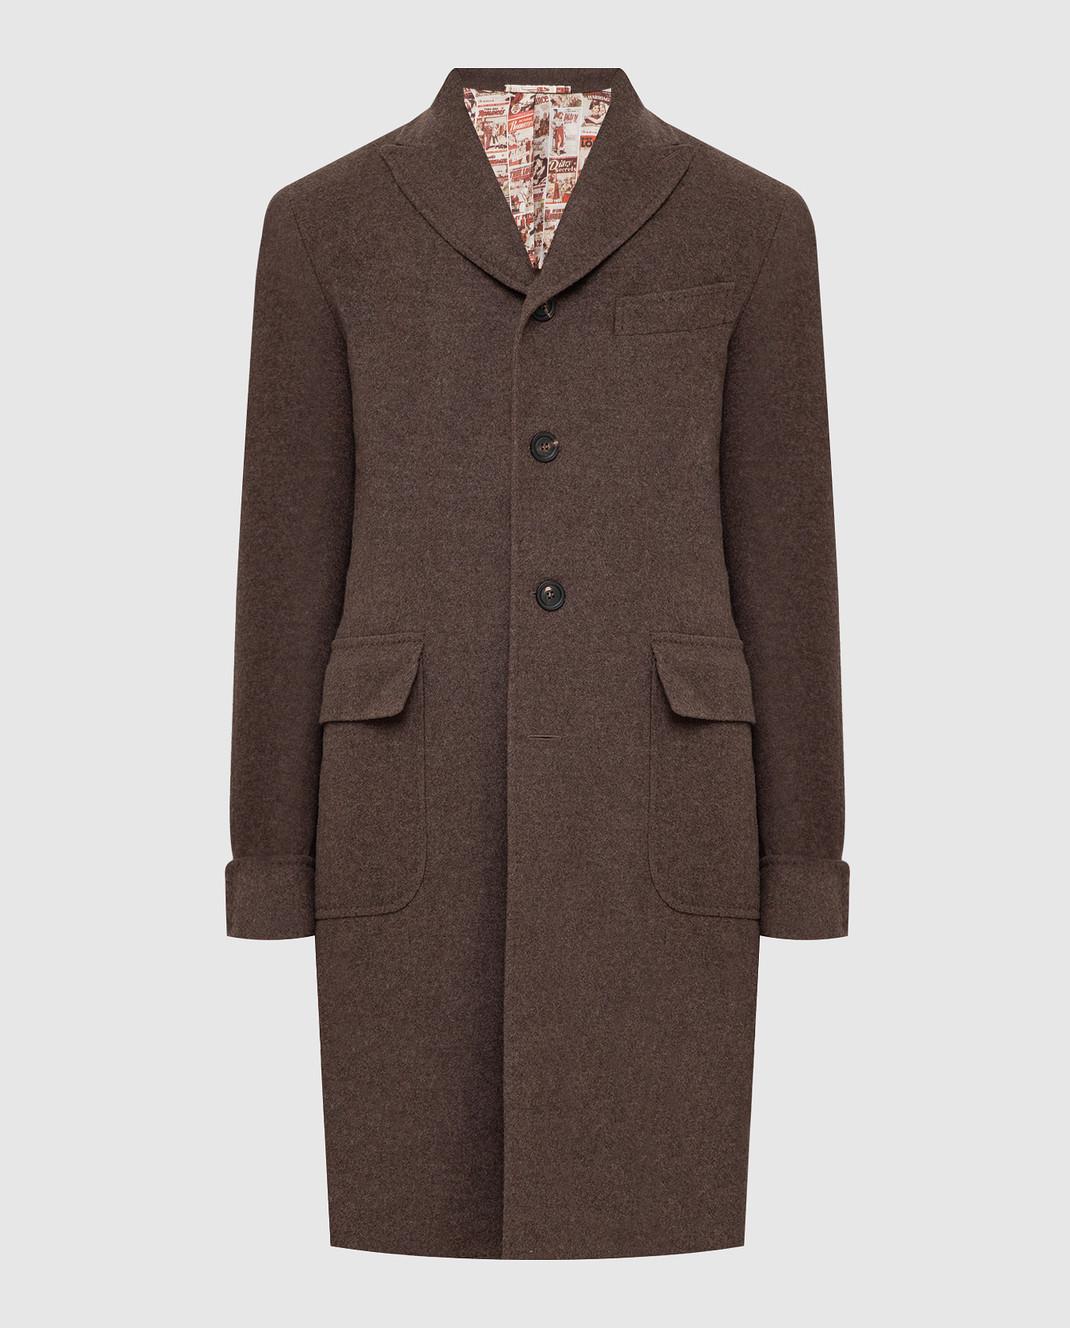 Stile Latino Коричневое пальто из шерсти и кашемира CUALFIO4592TMC20